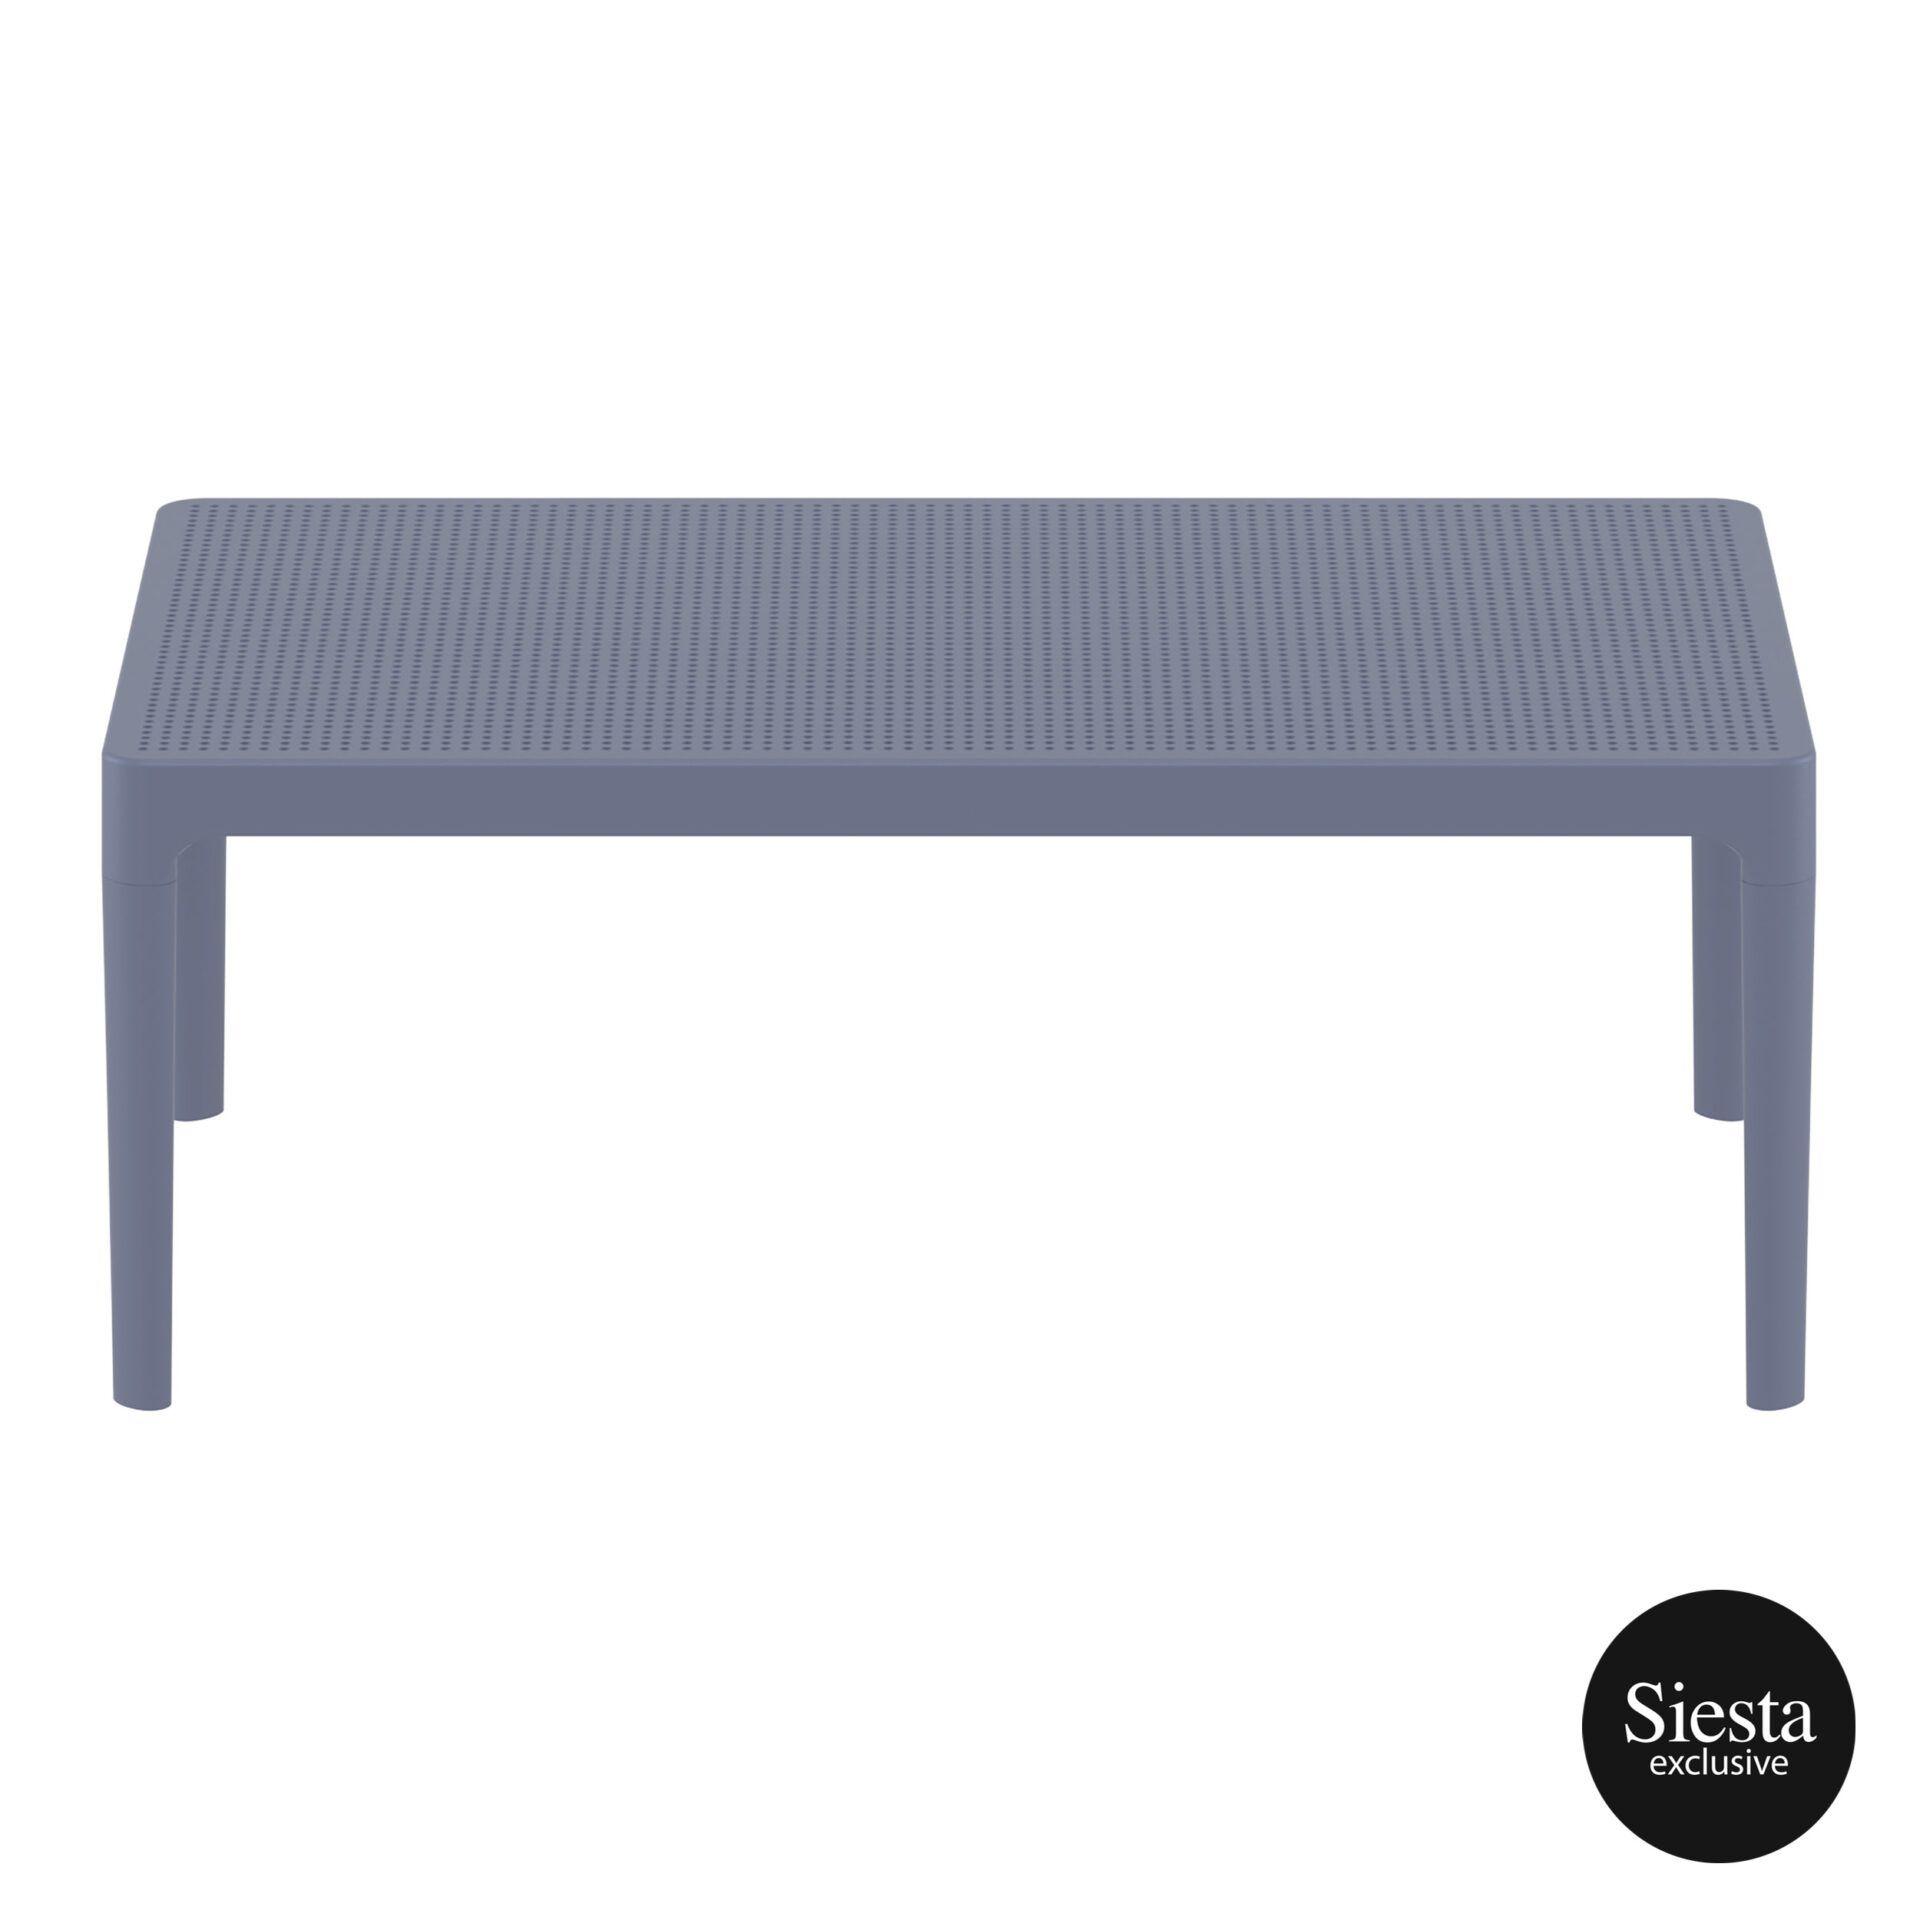 polypropylene outdoor sky lounge coffee table darkgrey long edge 1